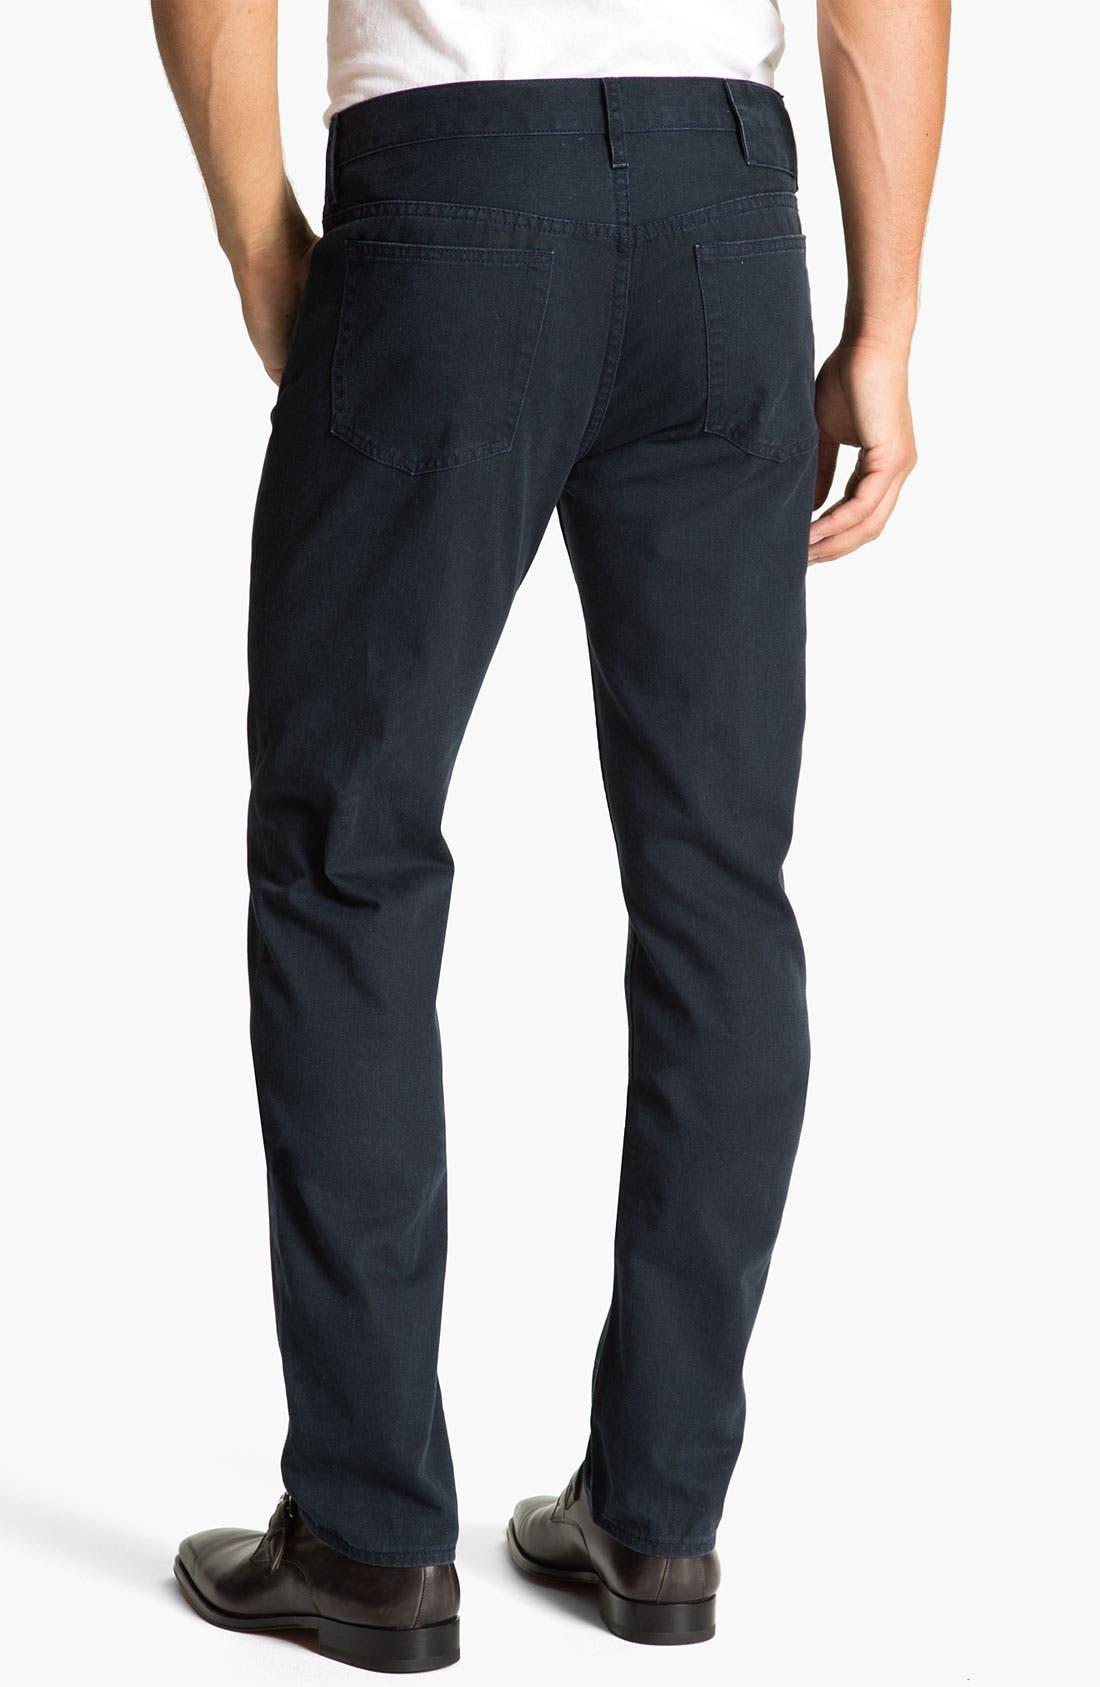 Main Image - MARC BY MARC JACOBS Slim Straight Leg Jeans (Darkest Teal)